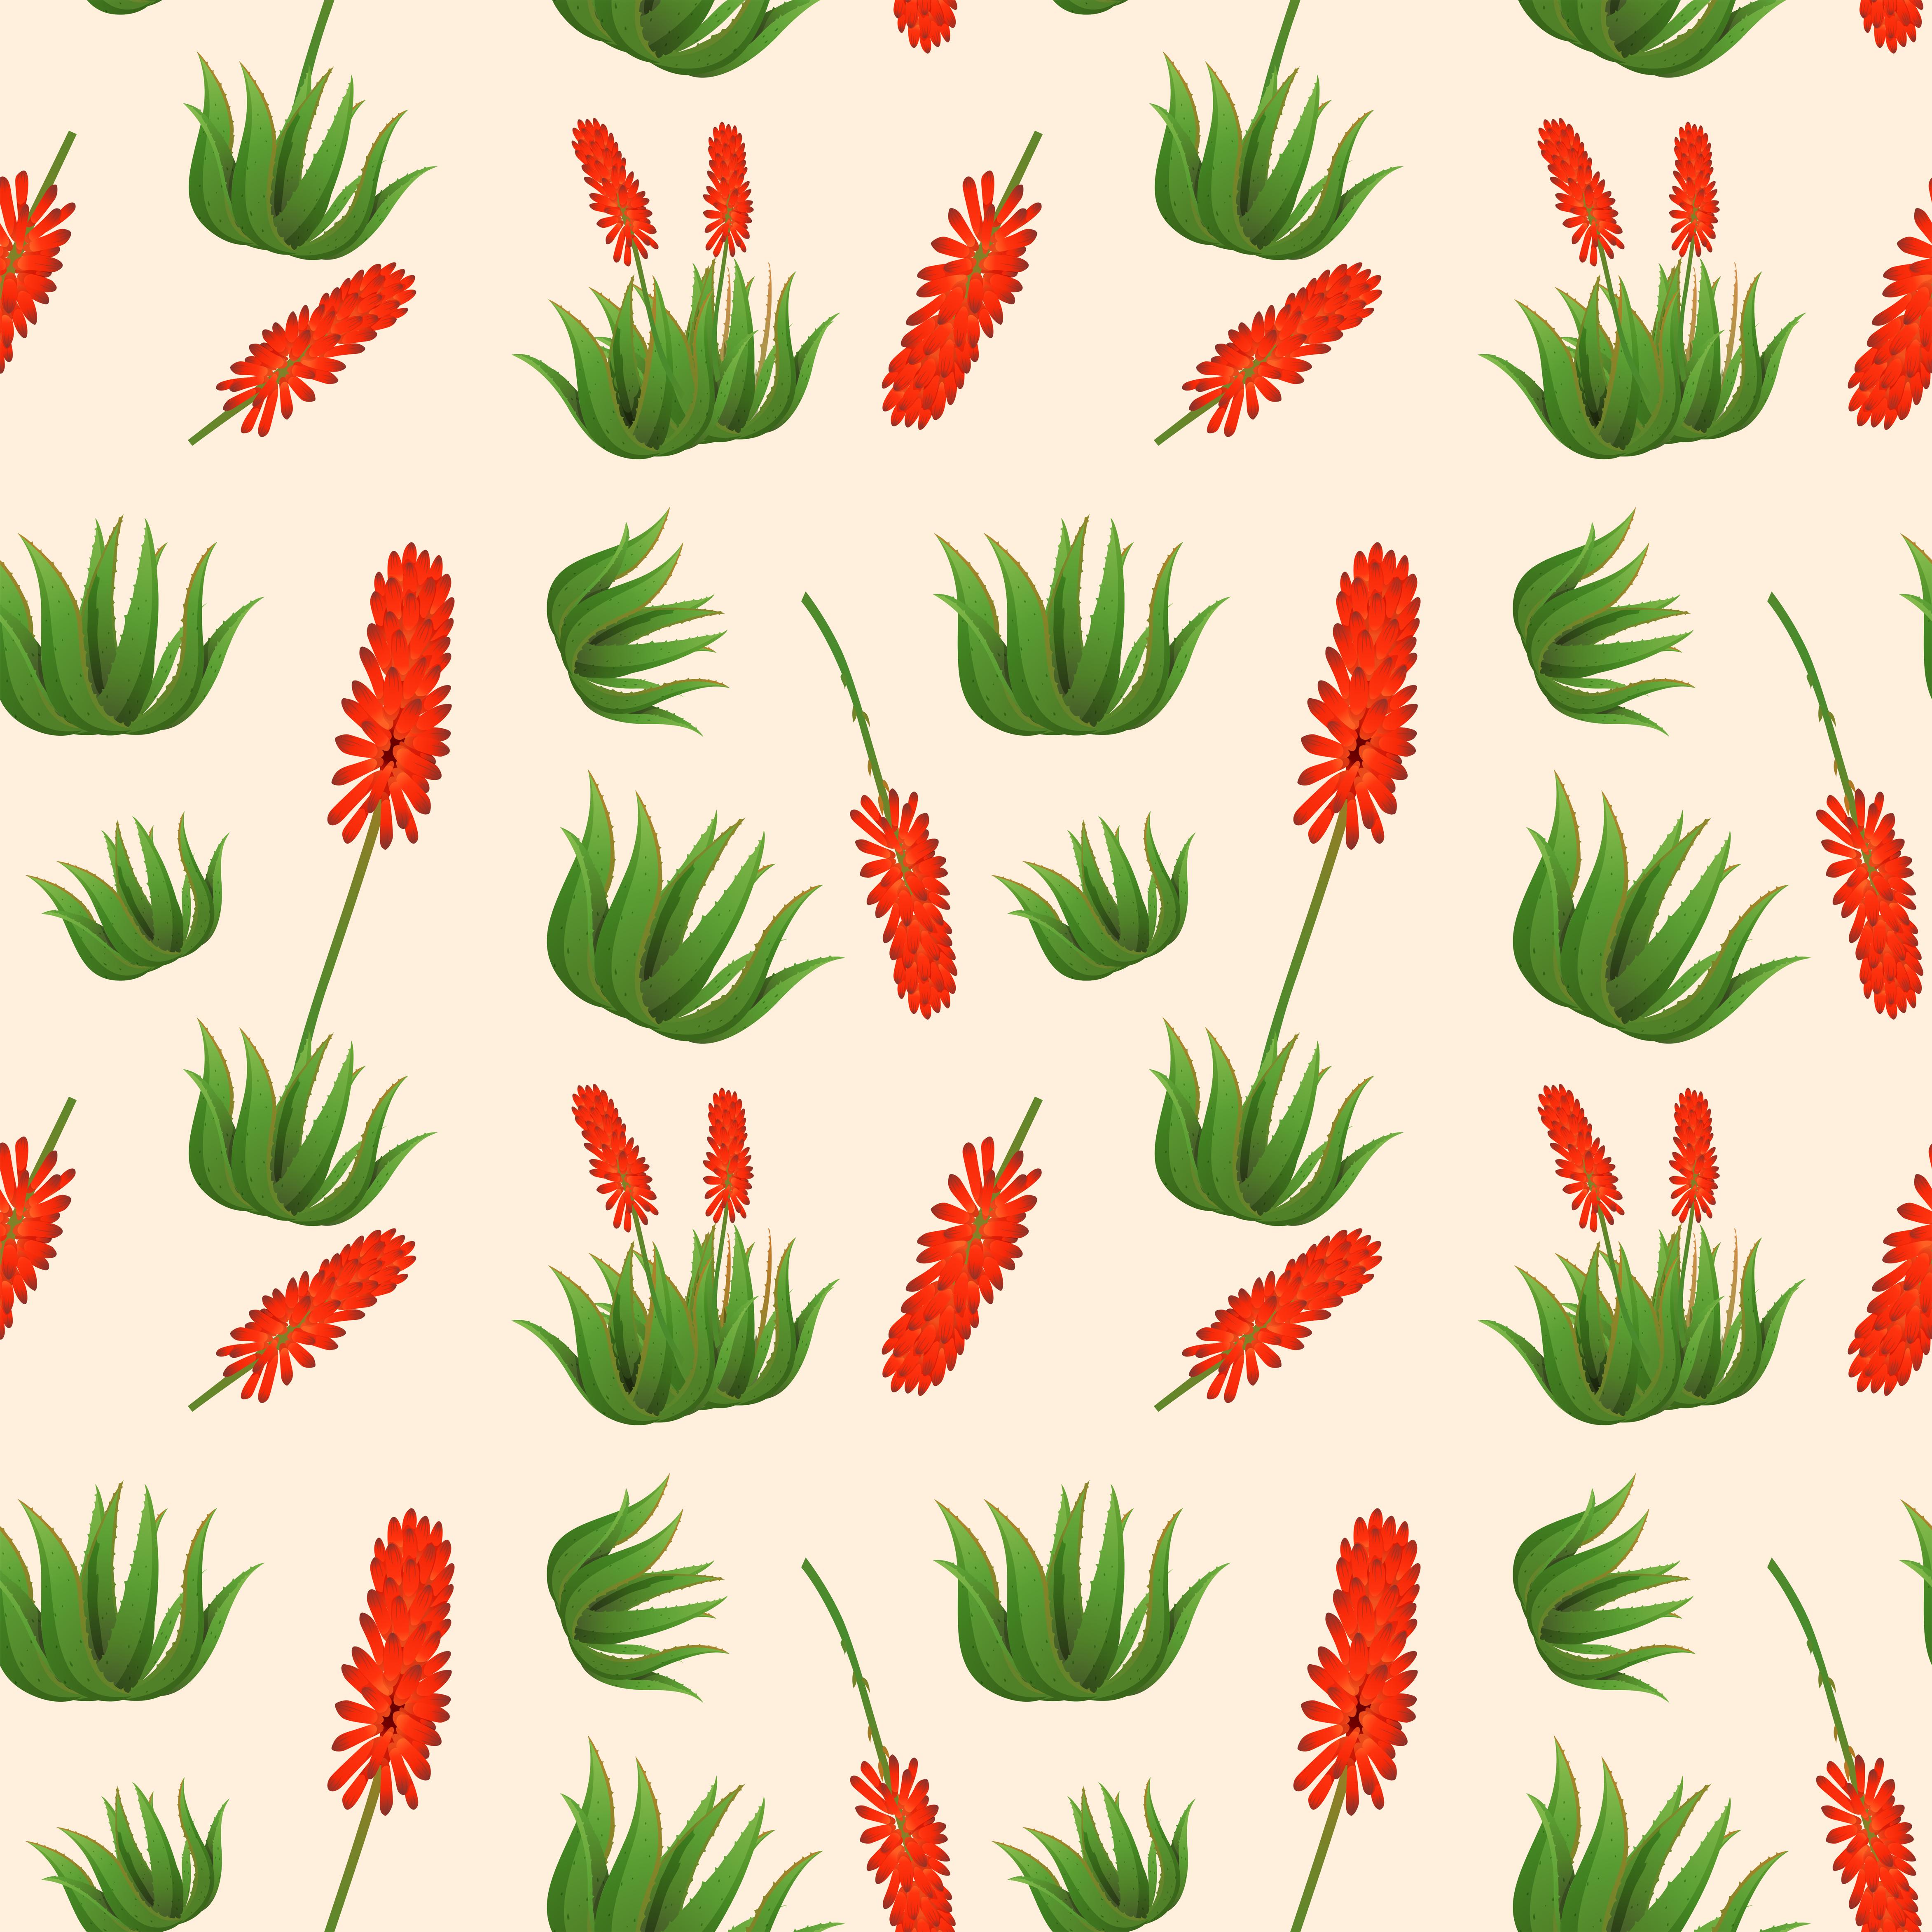 Aloe Vera Flower Seamless Pattern Download Free Vectors Clipart Graphics Amp Vector Art